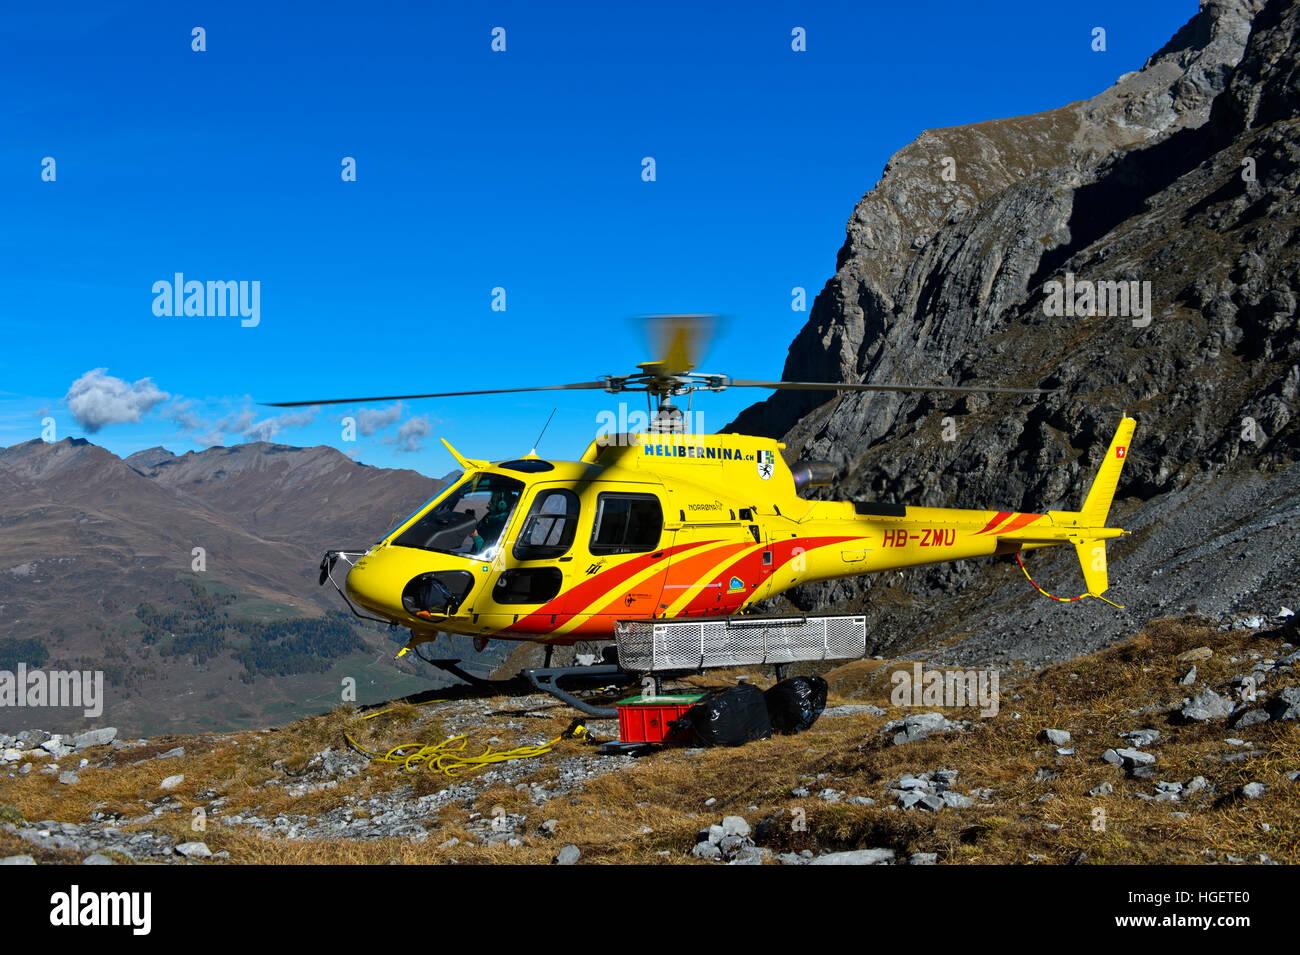 Helicopter Eurocopter AS350 Ecureuil of Heli Bernina AG on a mountainous landing place, Val Lischana, Graubunden, - Stock Image